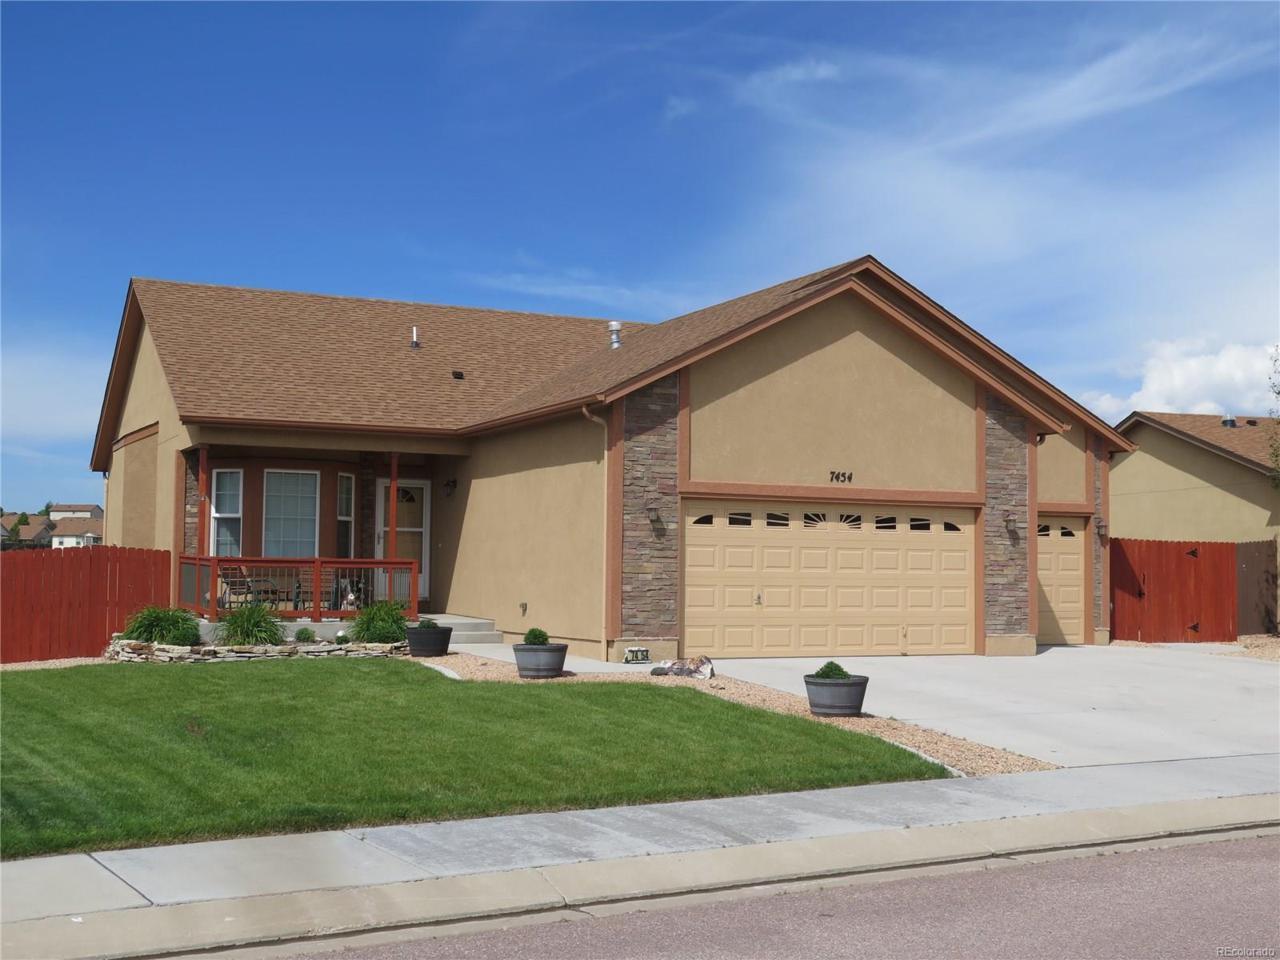 7454 Waterside Drive, Colorado Springs, CO 80925 (MLS #3479562) :: 8z Real Estate